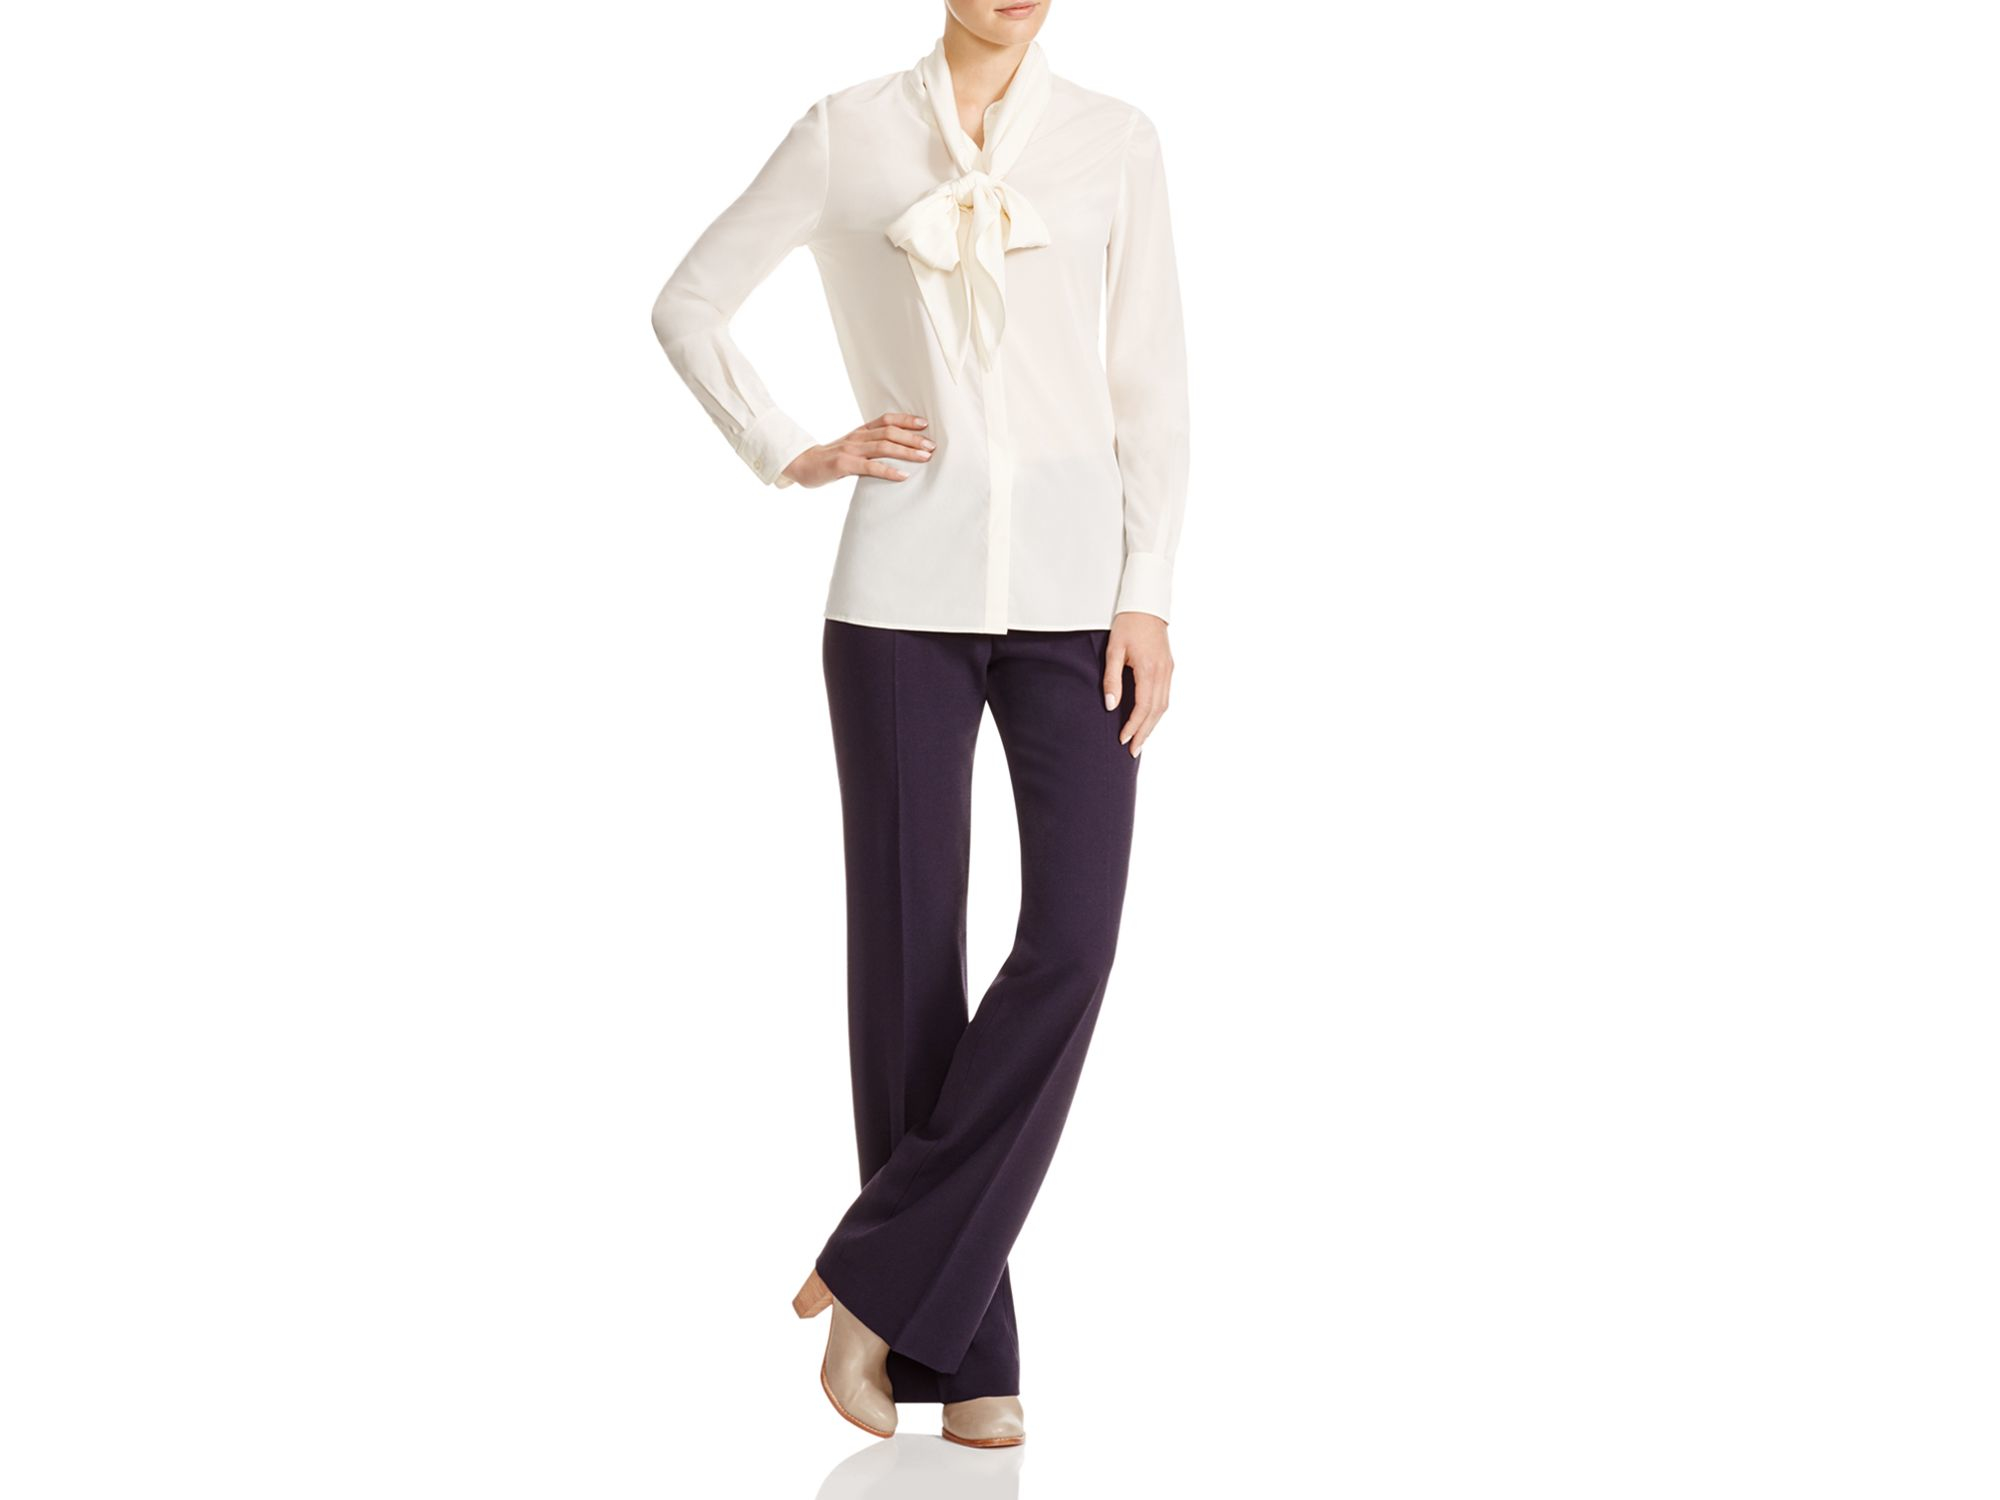 2dfd626195df5 Lyst - Tory Burch Stretch Silk Tie Neck Blouse in White